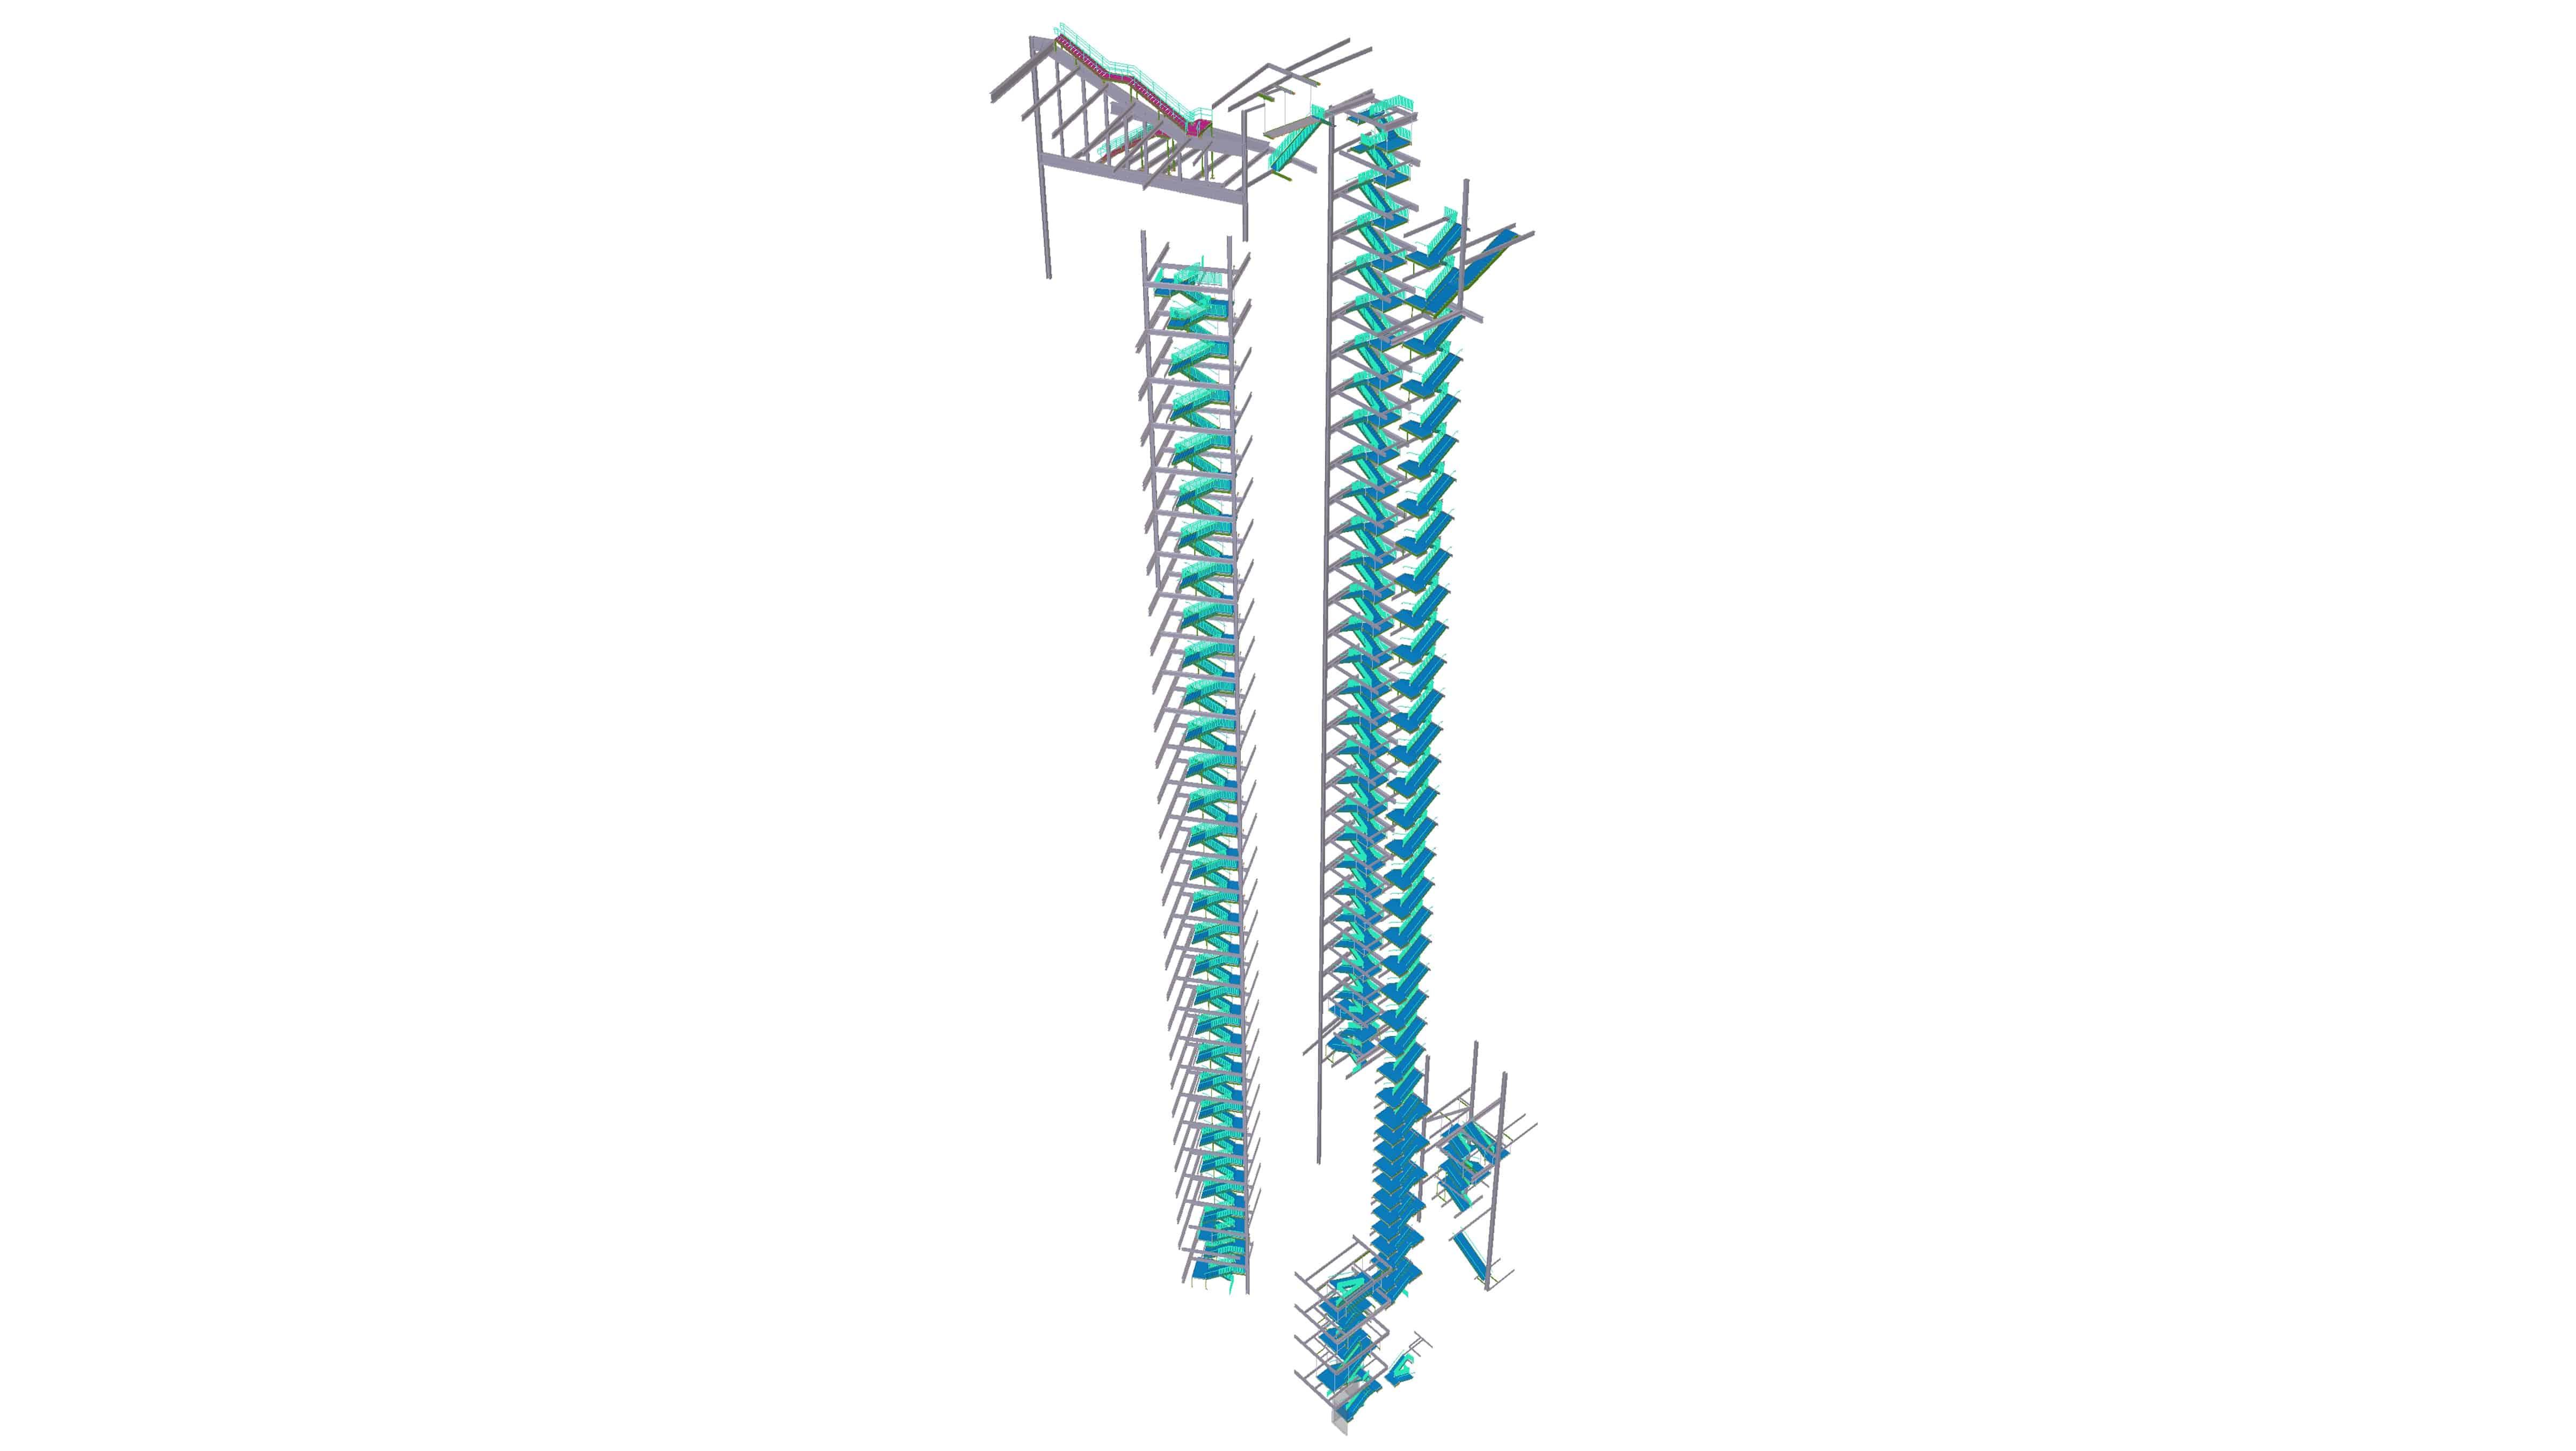 northwestern2 - Steel concrete & rebar detailing, Tekla structural design & consulting. JMT Consultants